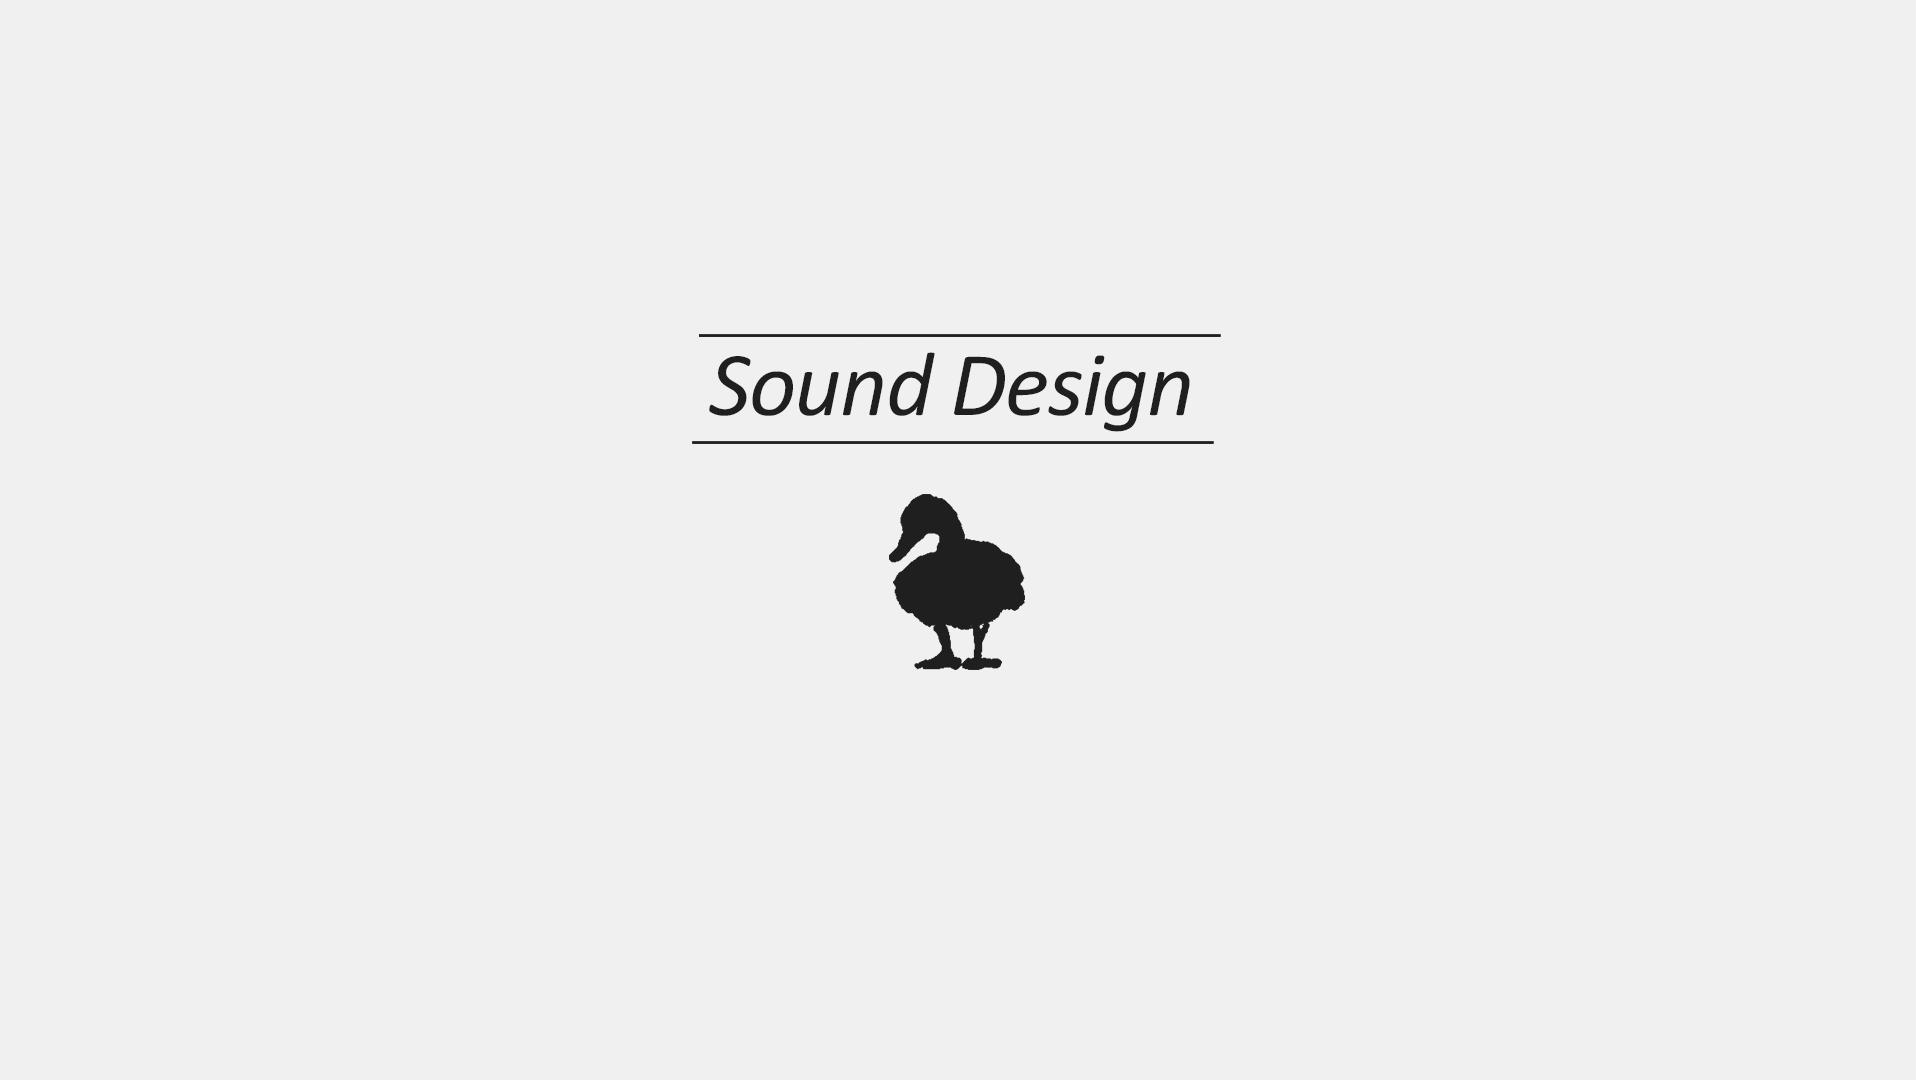 Sound Design Reel Thumb 2019.jpg